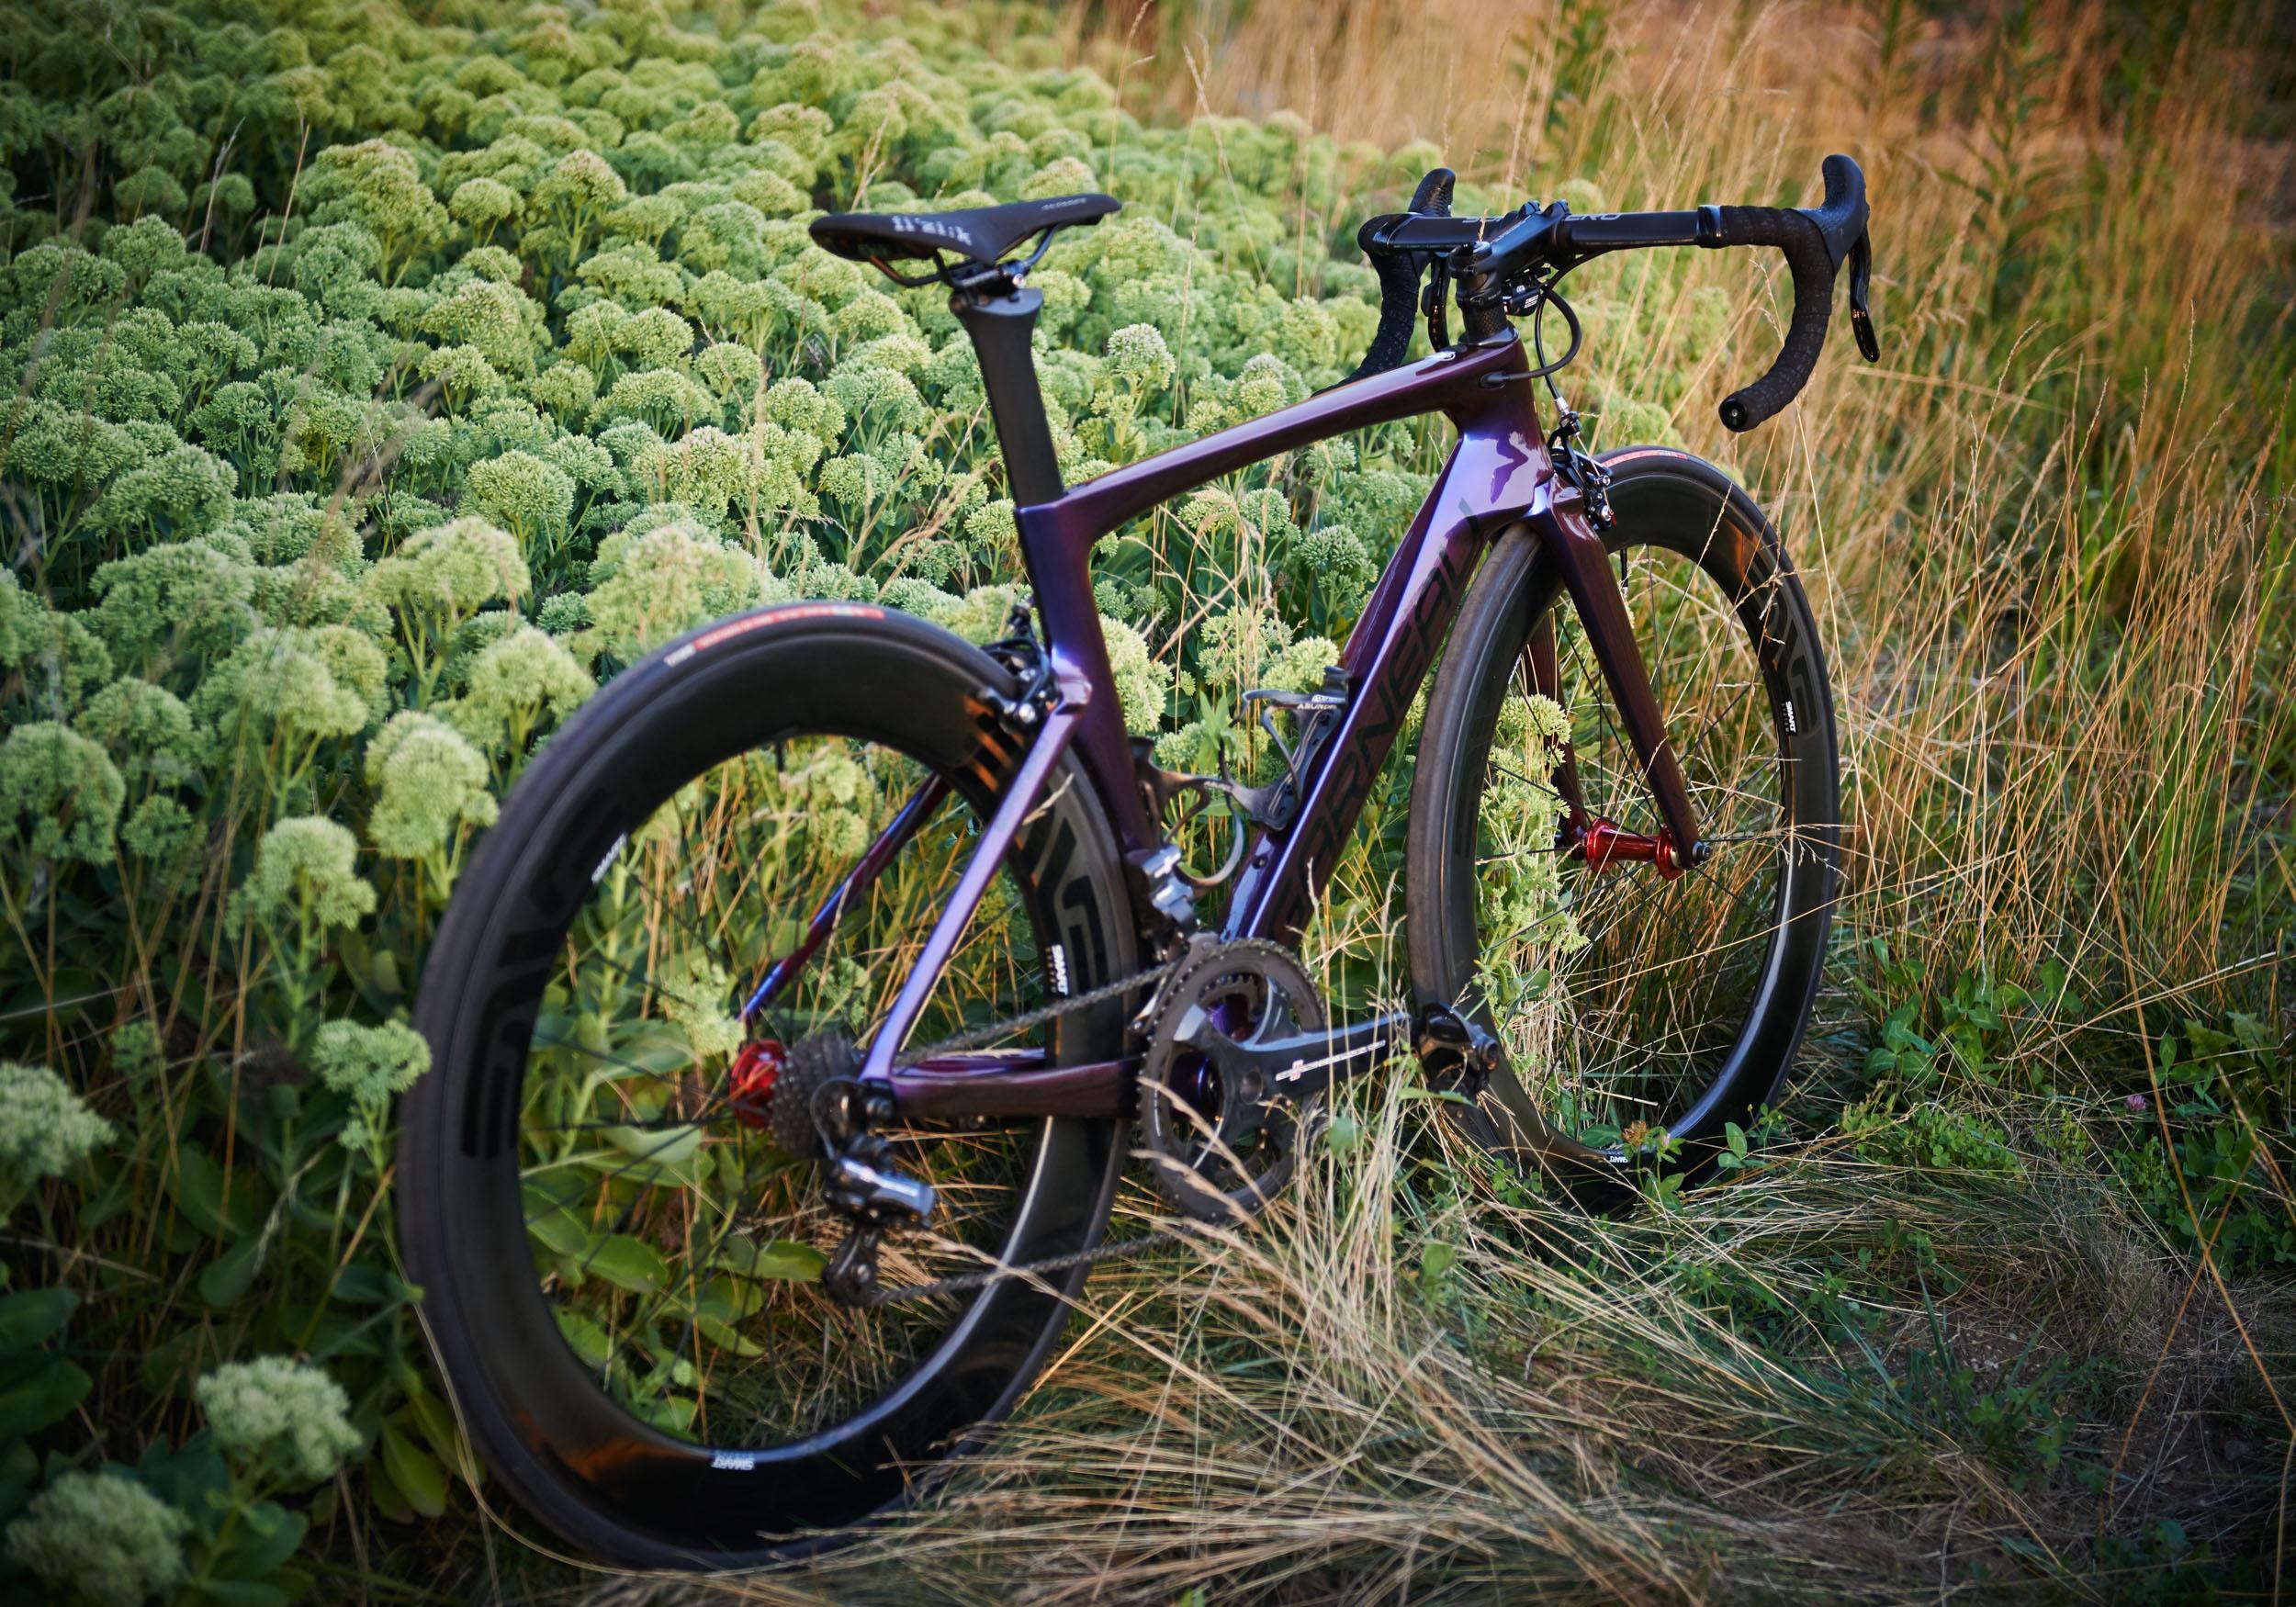 to-be-determined-garneau-a1-bike-review-101.jpg